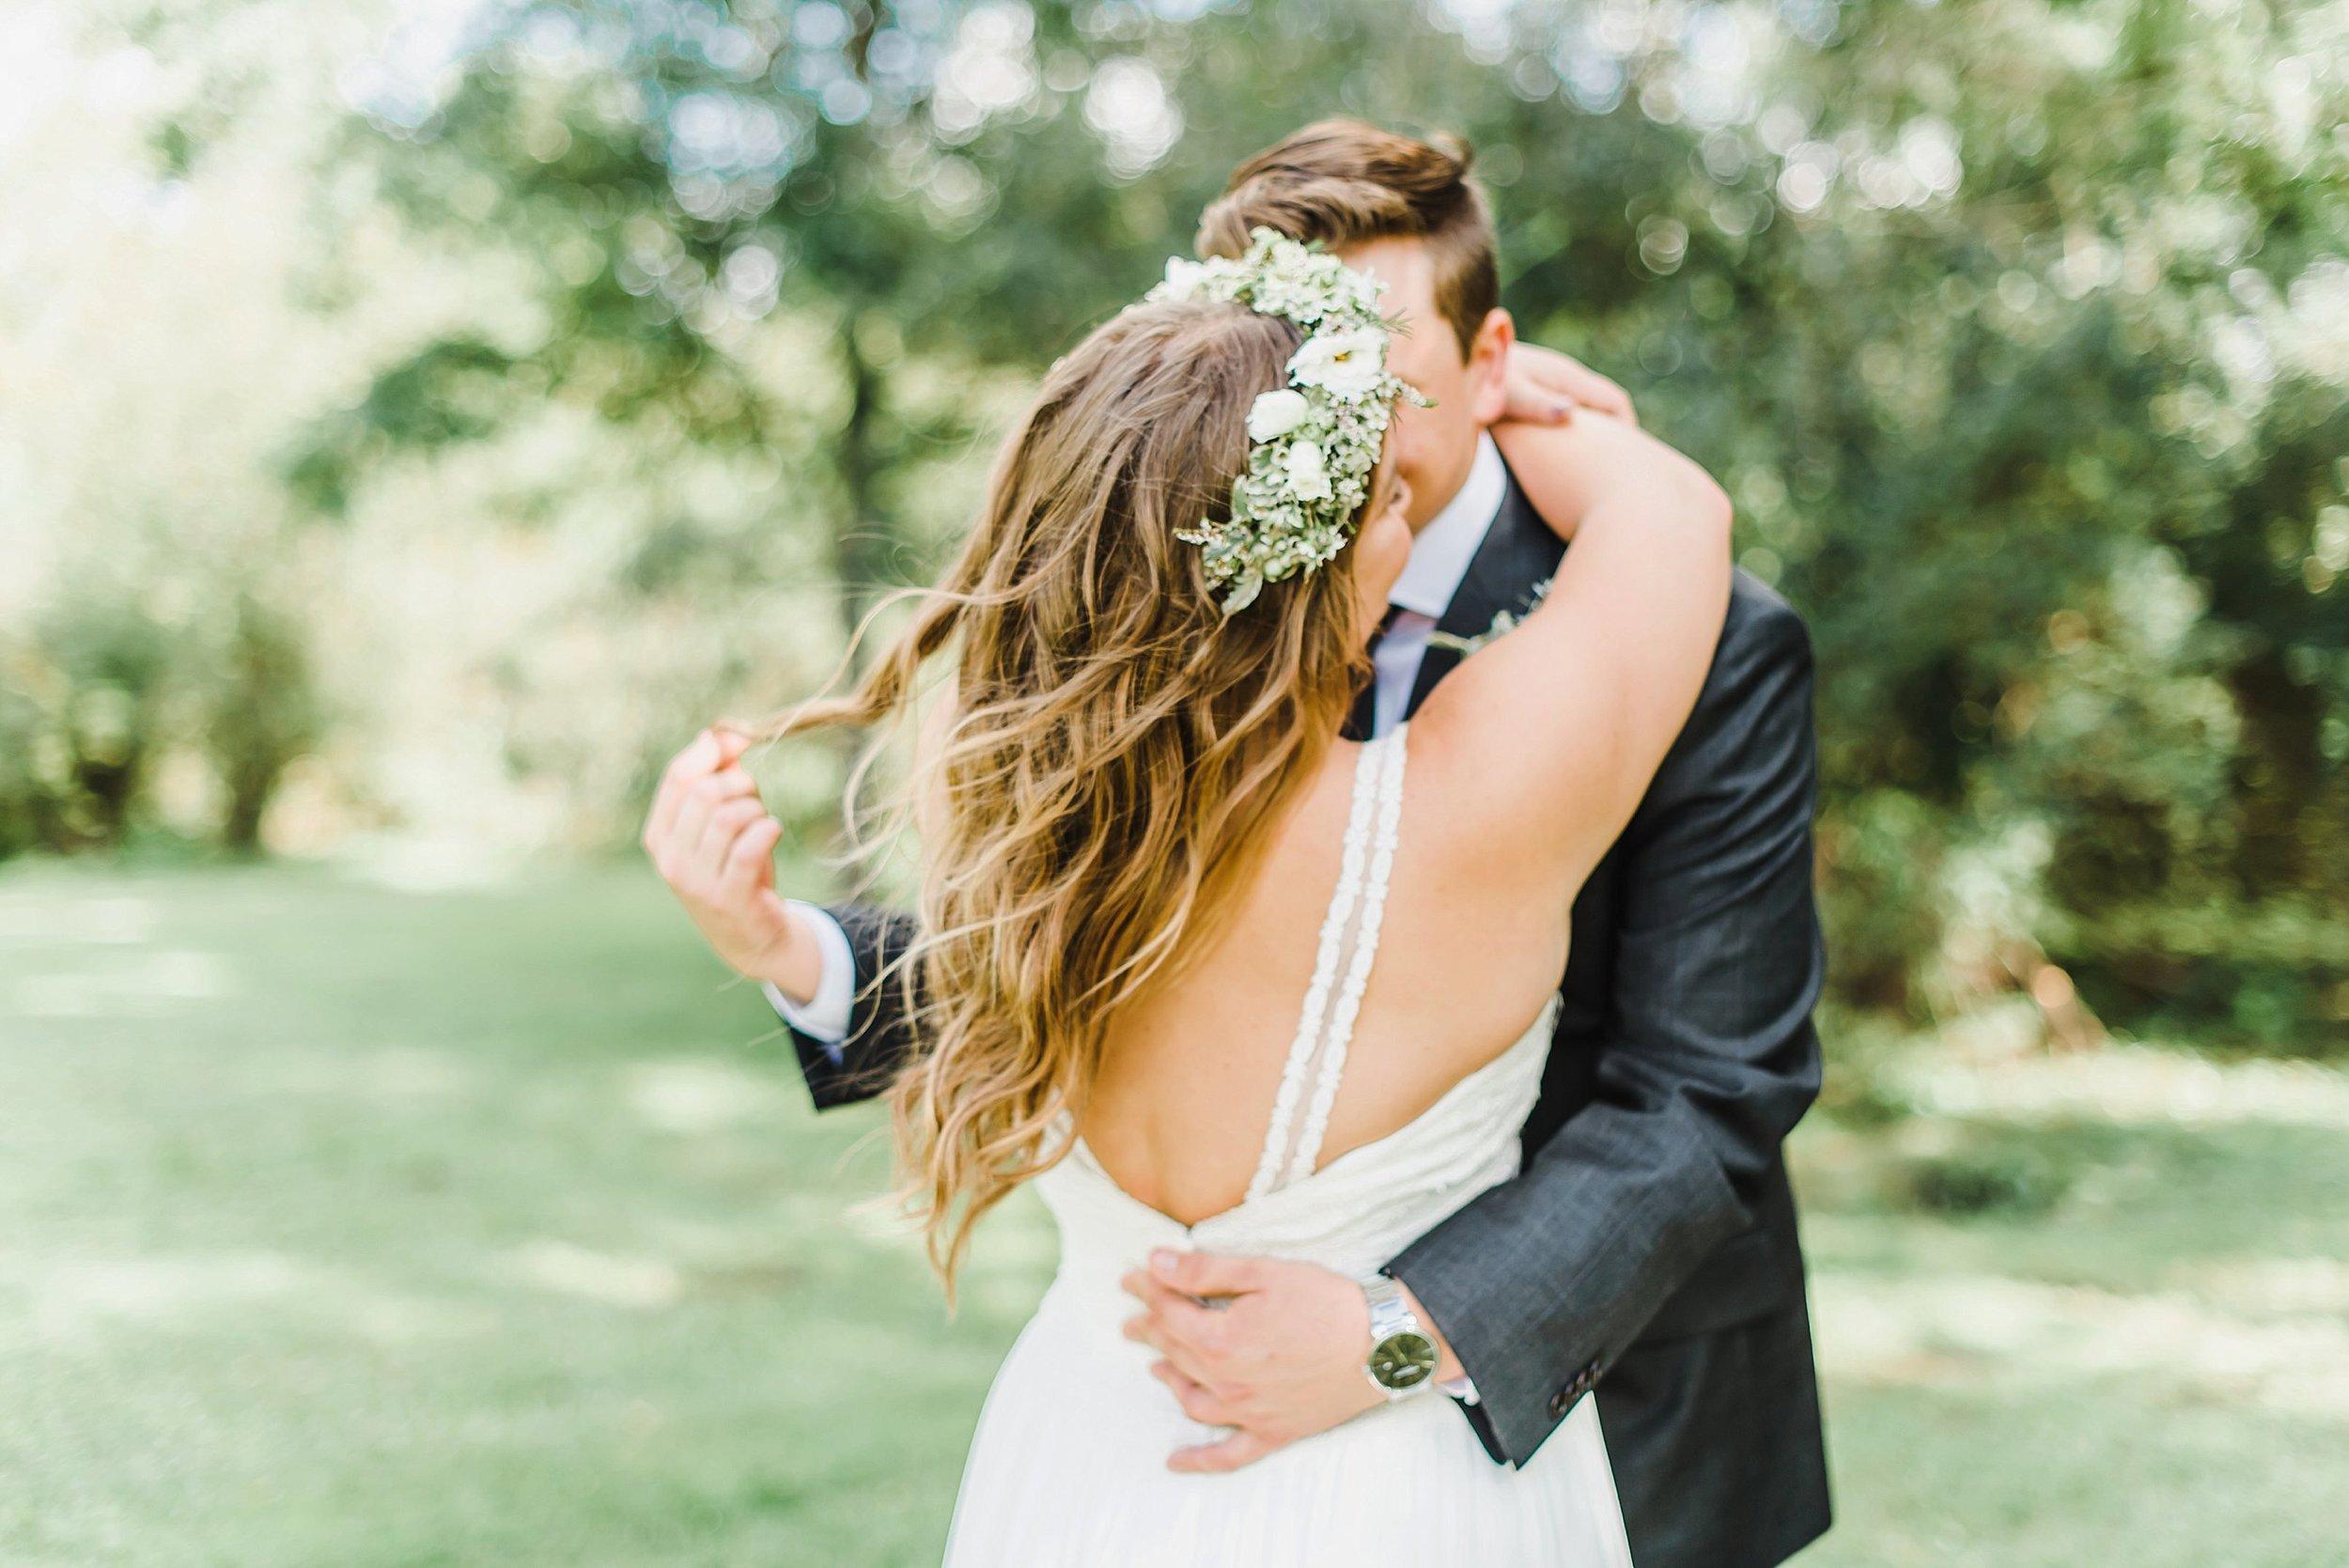 light airy indie fine art ottawa wedding photographer | Ali and Batoul Photography_1124.jpg